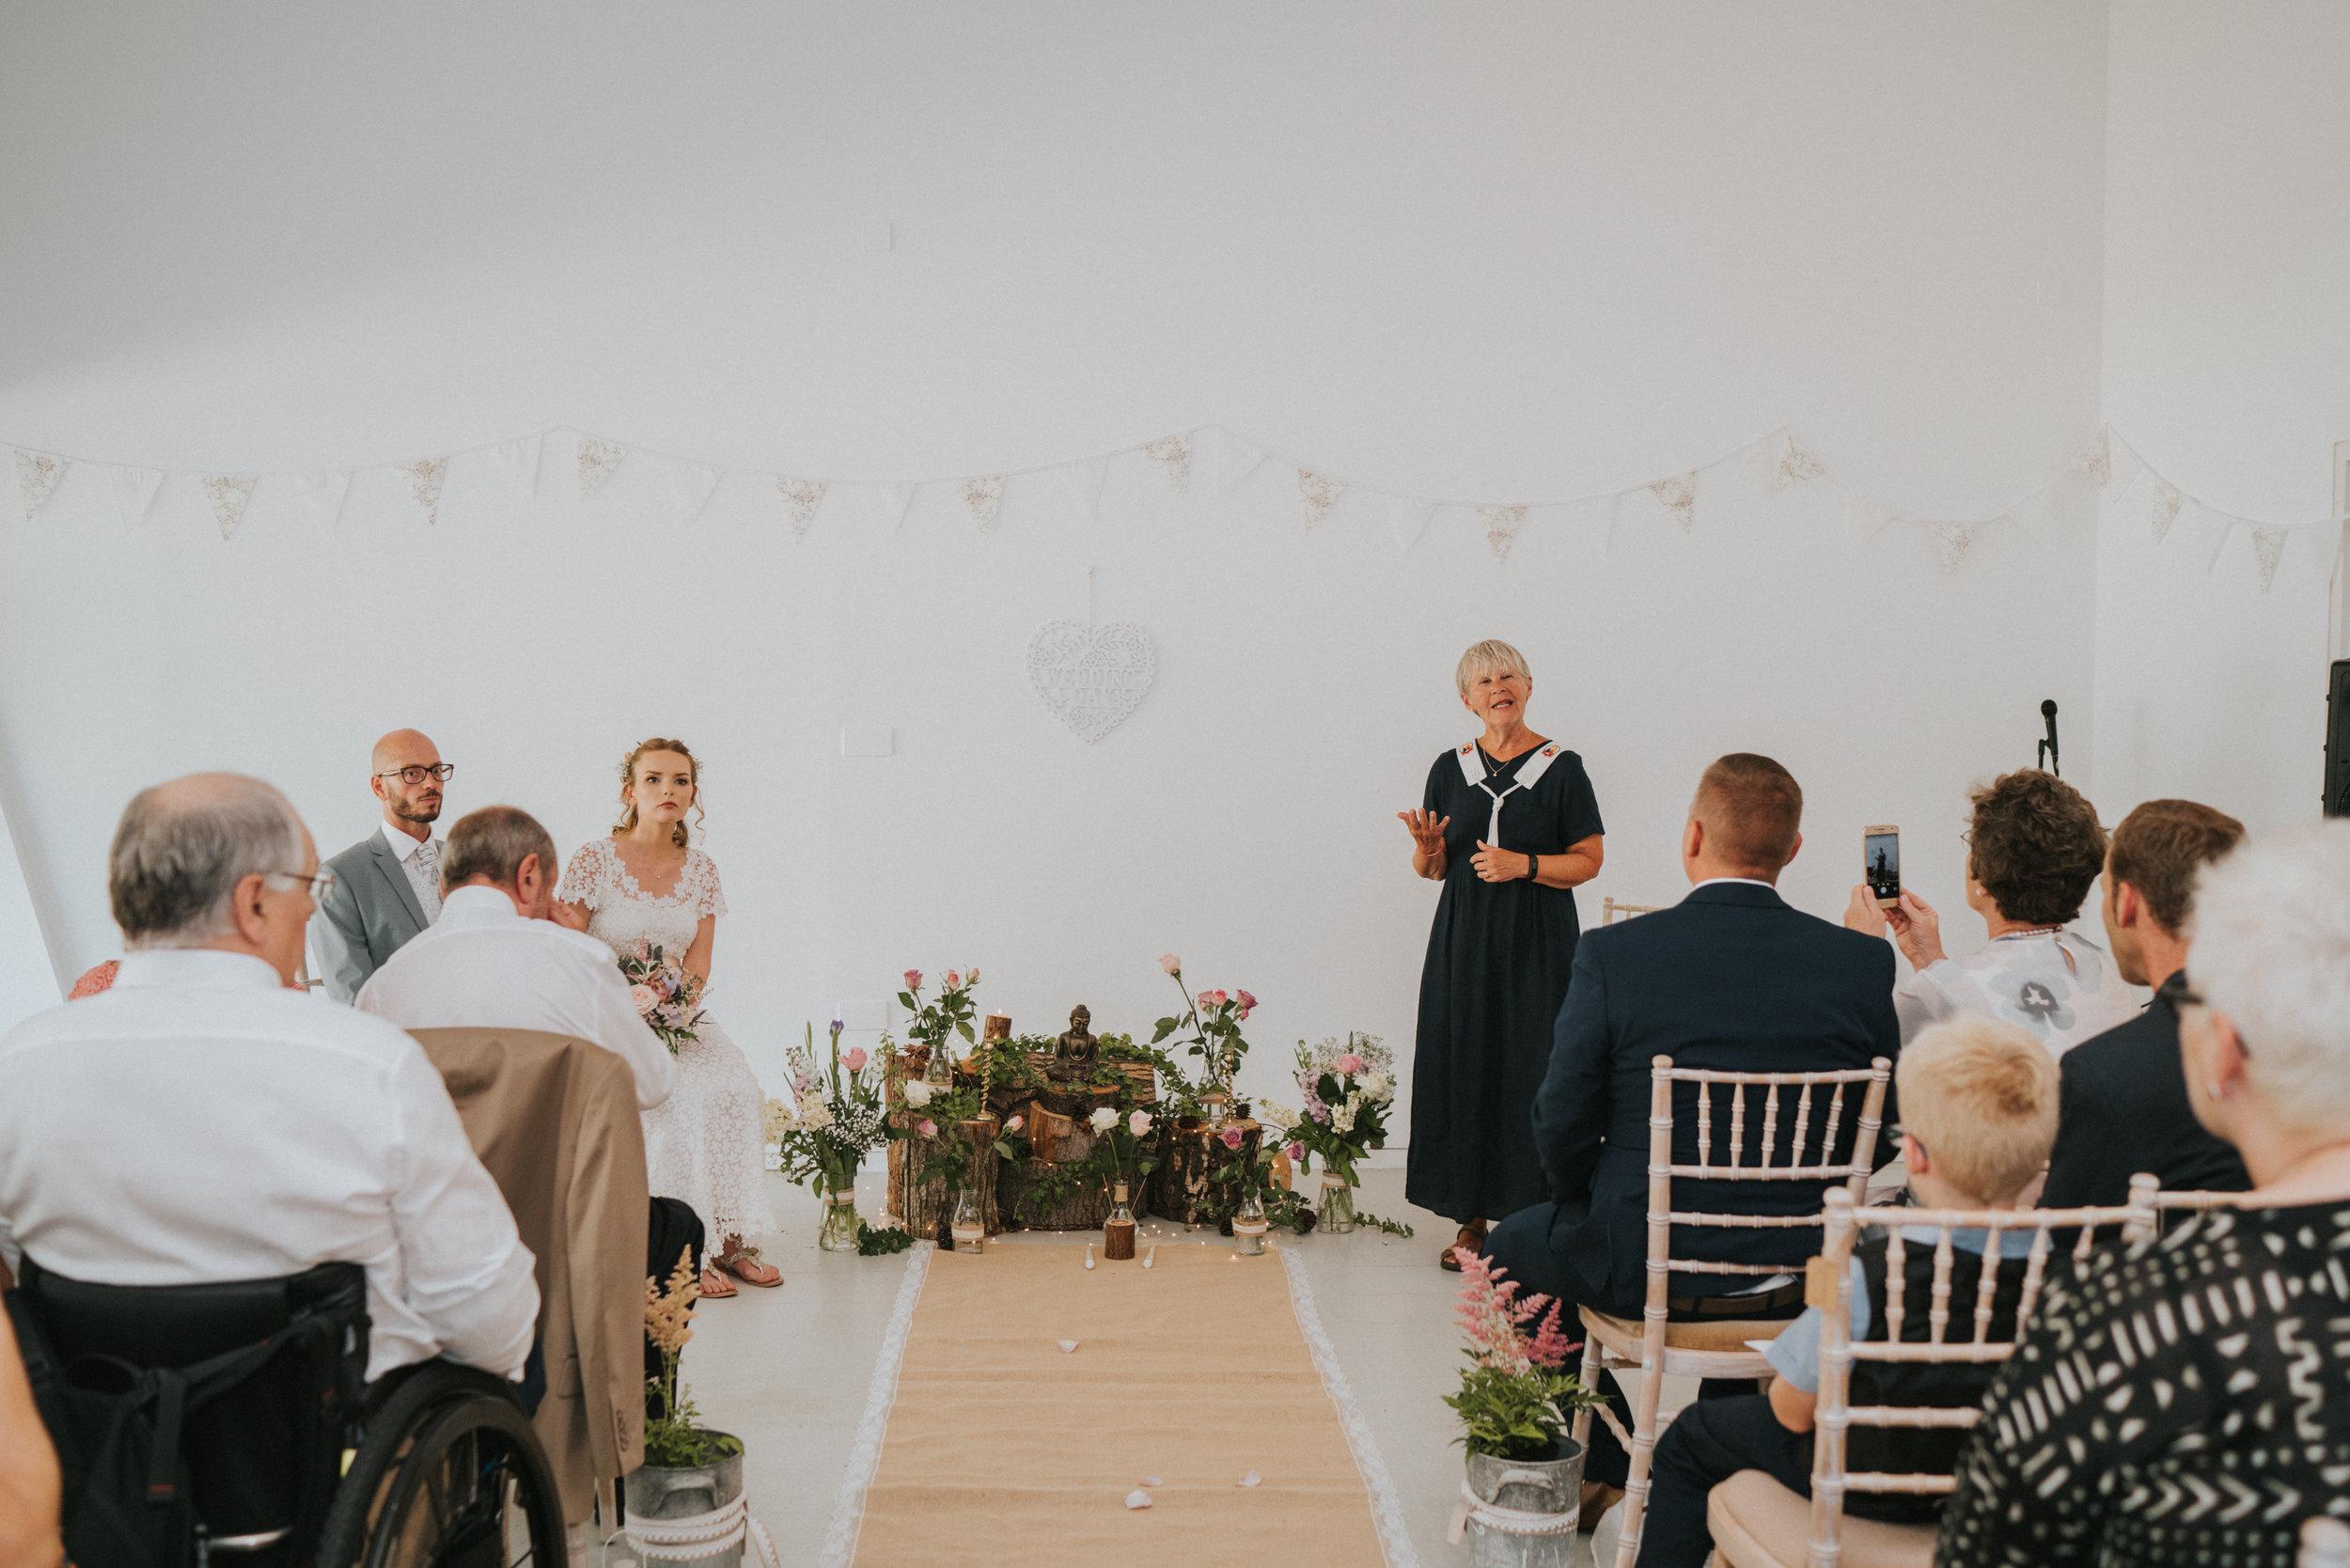 Grace-Elizabeth-Georgie-Amalaketu-Firstsite-Colchester-Essex-Boho-Buddhist-Wedding-Alternative-Wedding-Photography-Essex (45 of 100).jpg